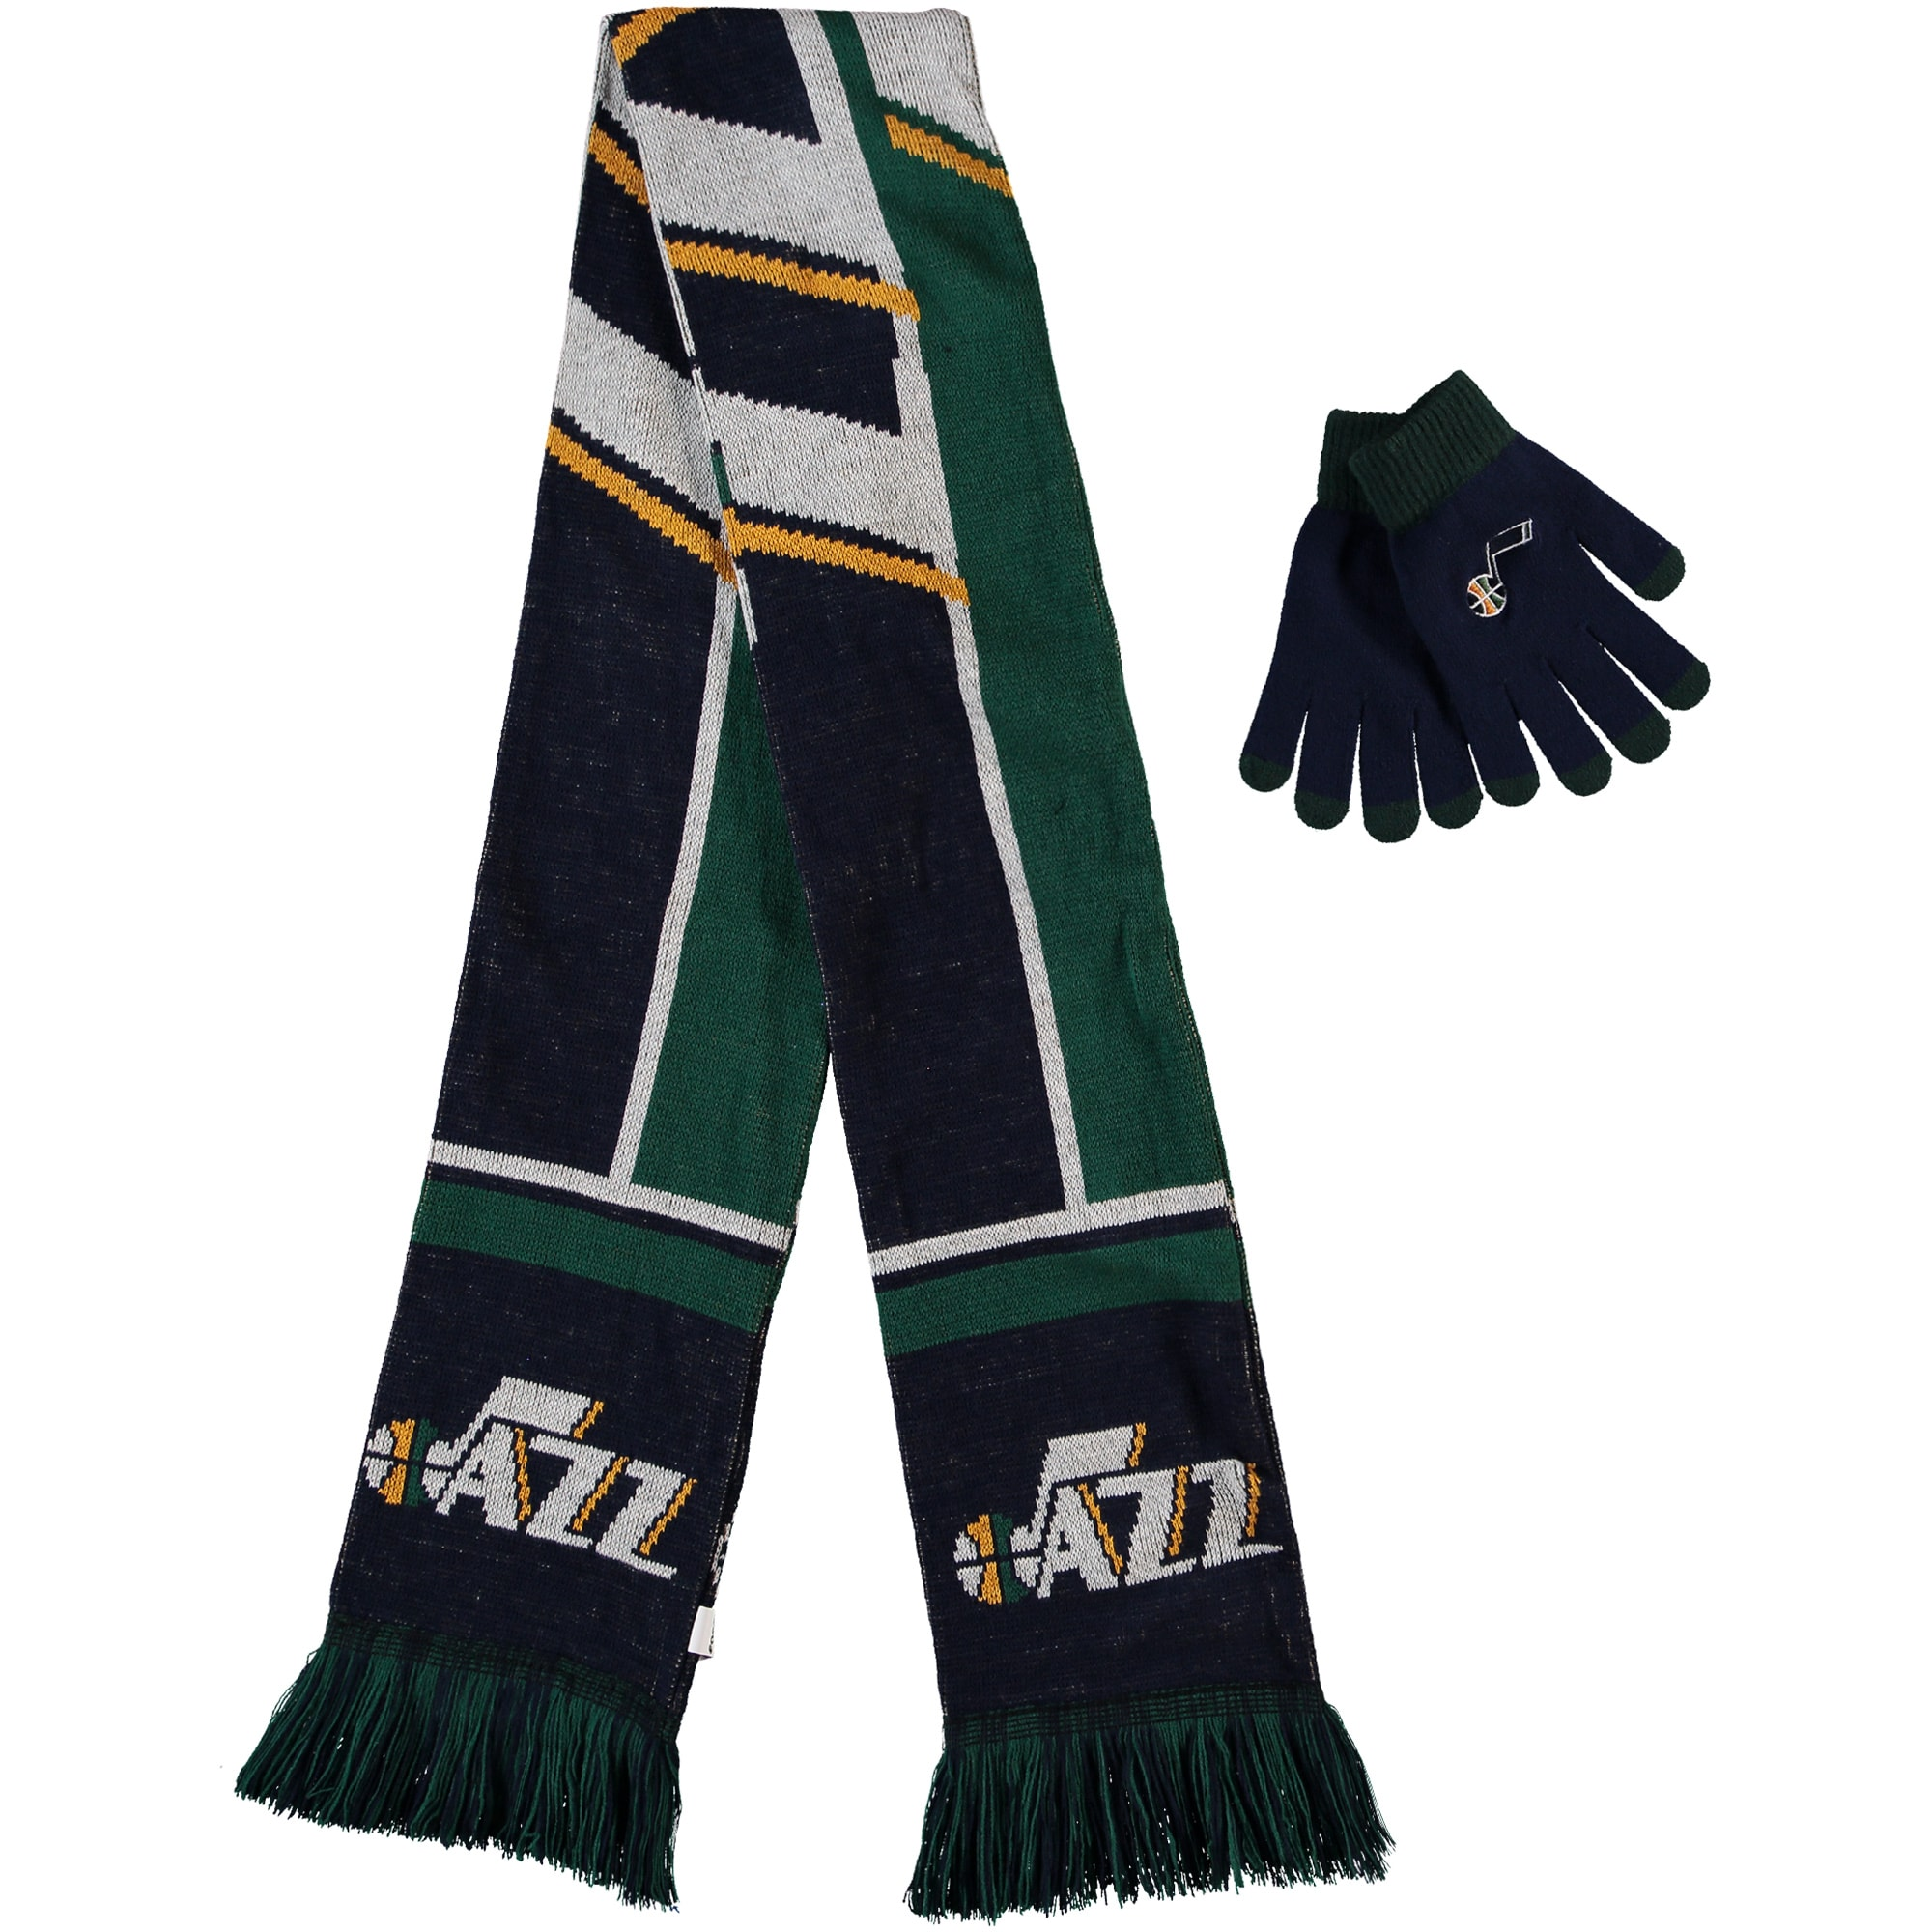 Utah Jazz Hol Gloves & Scarf Set